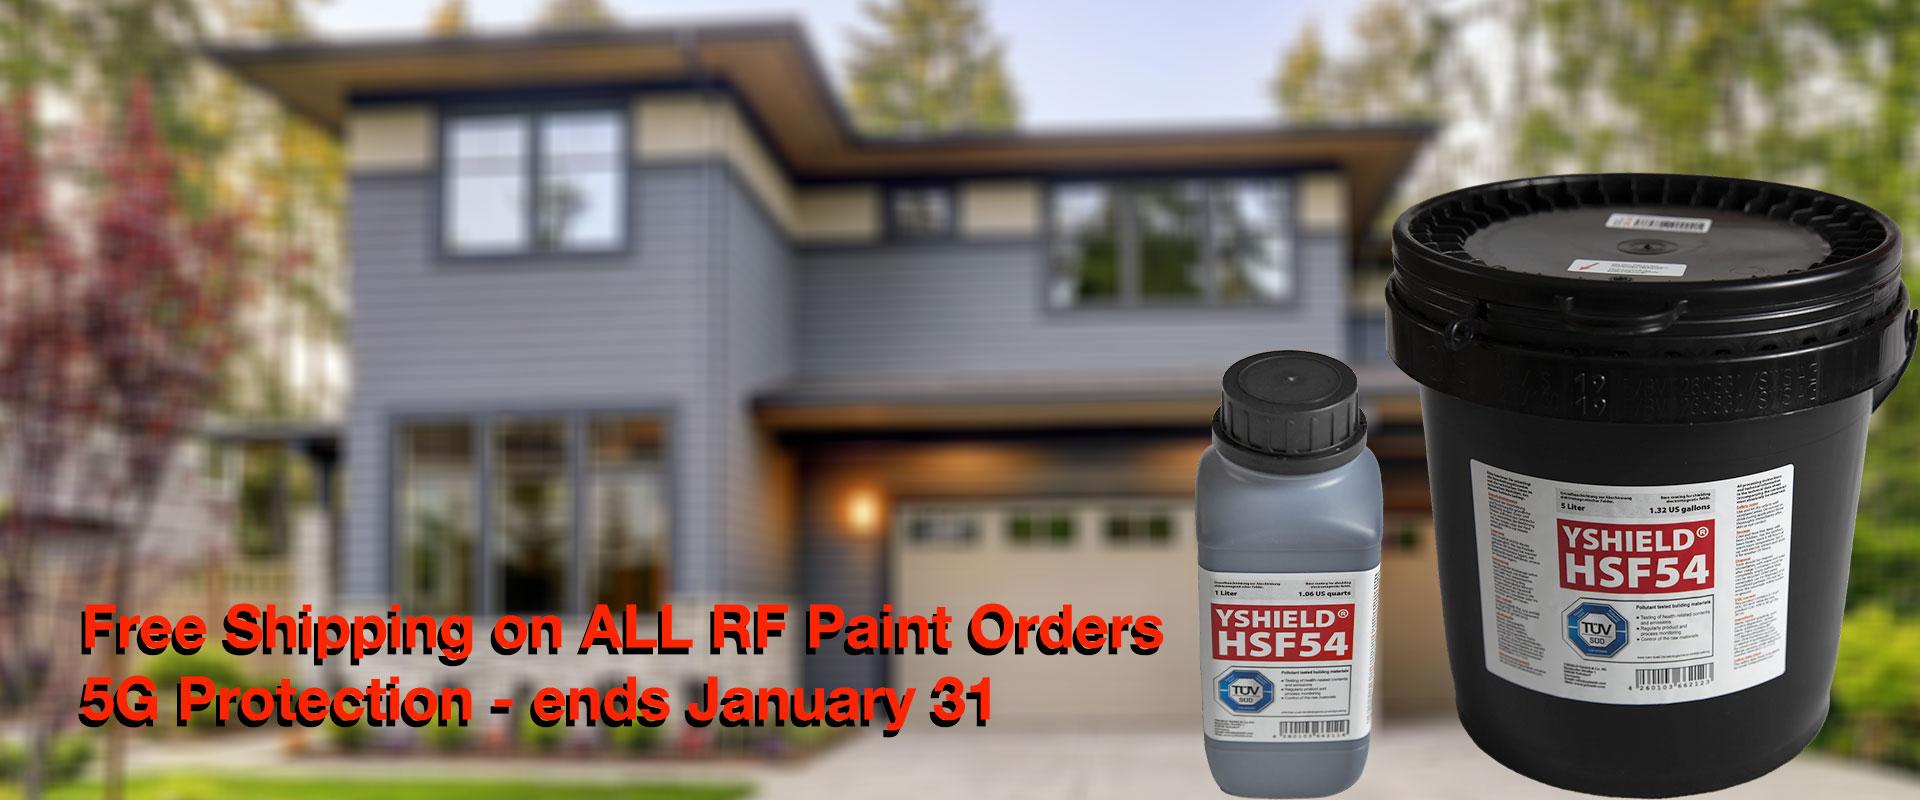 paint-promo-free-shipping.jpg